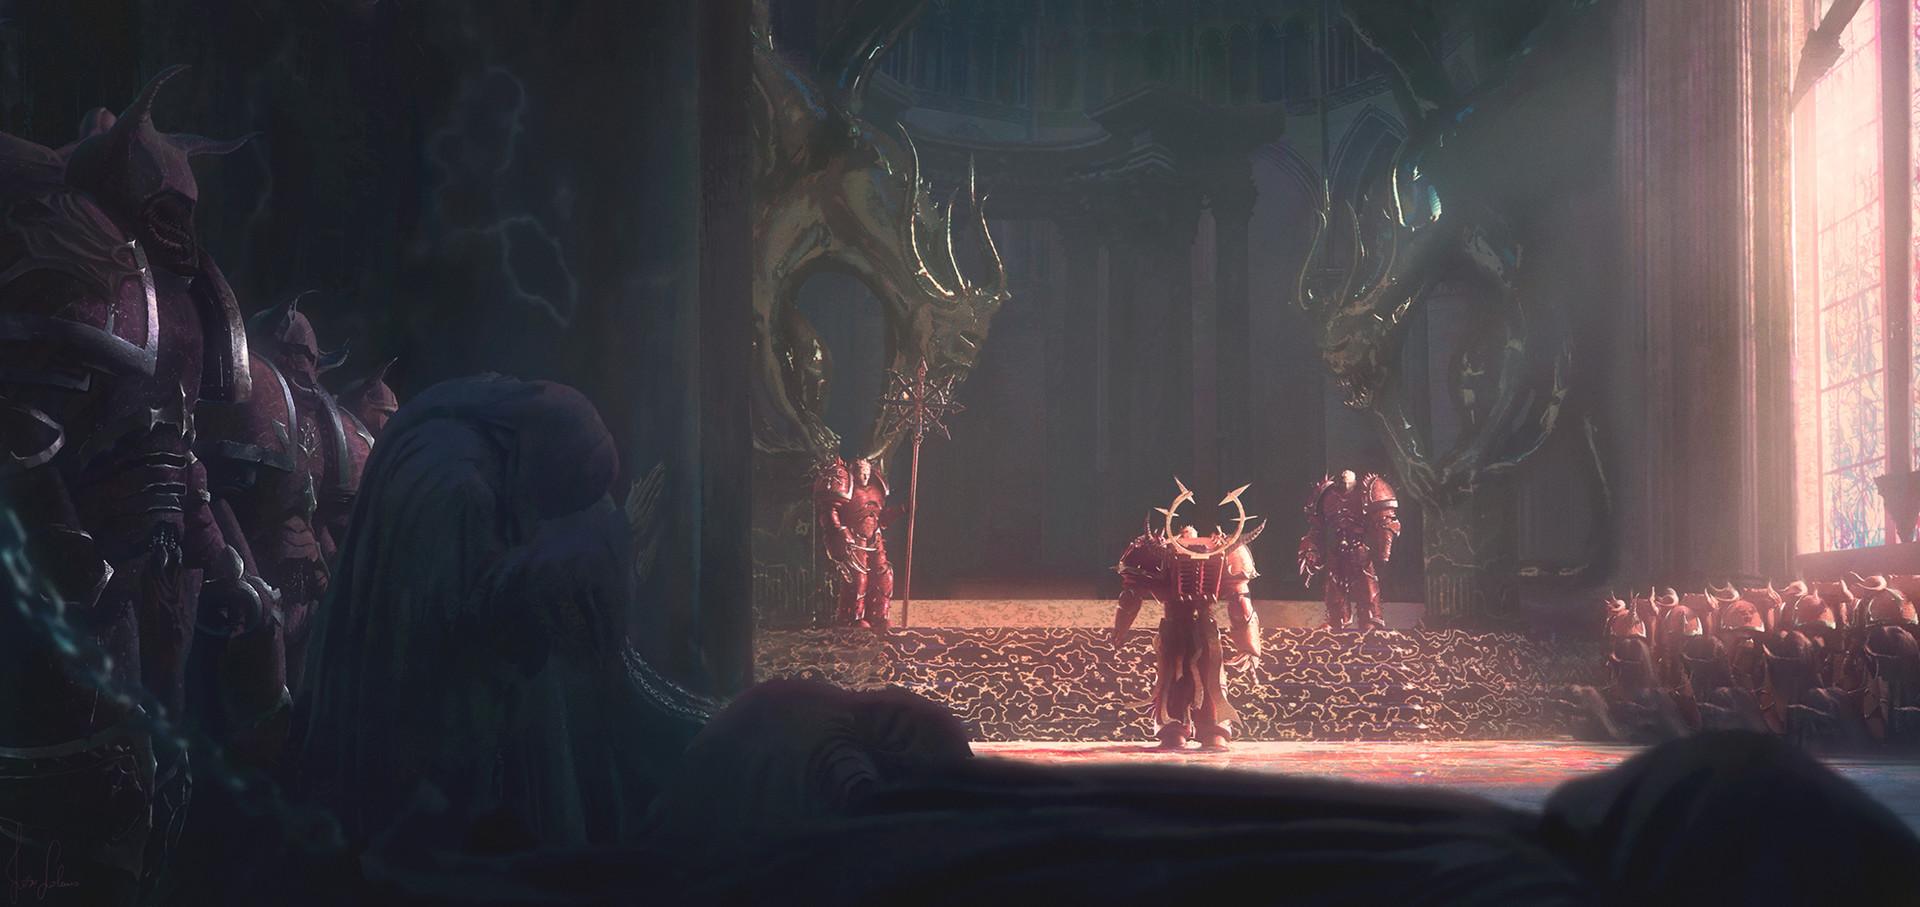 Josu solano final illustration